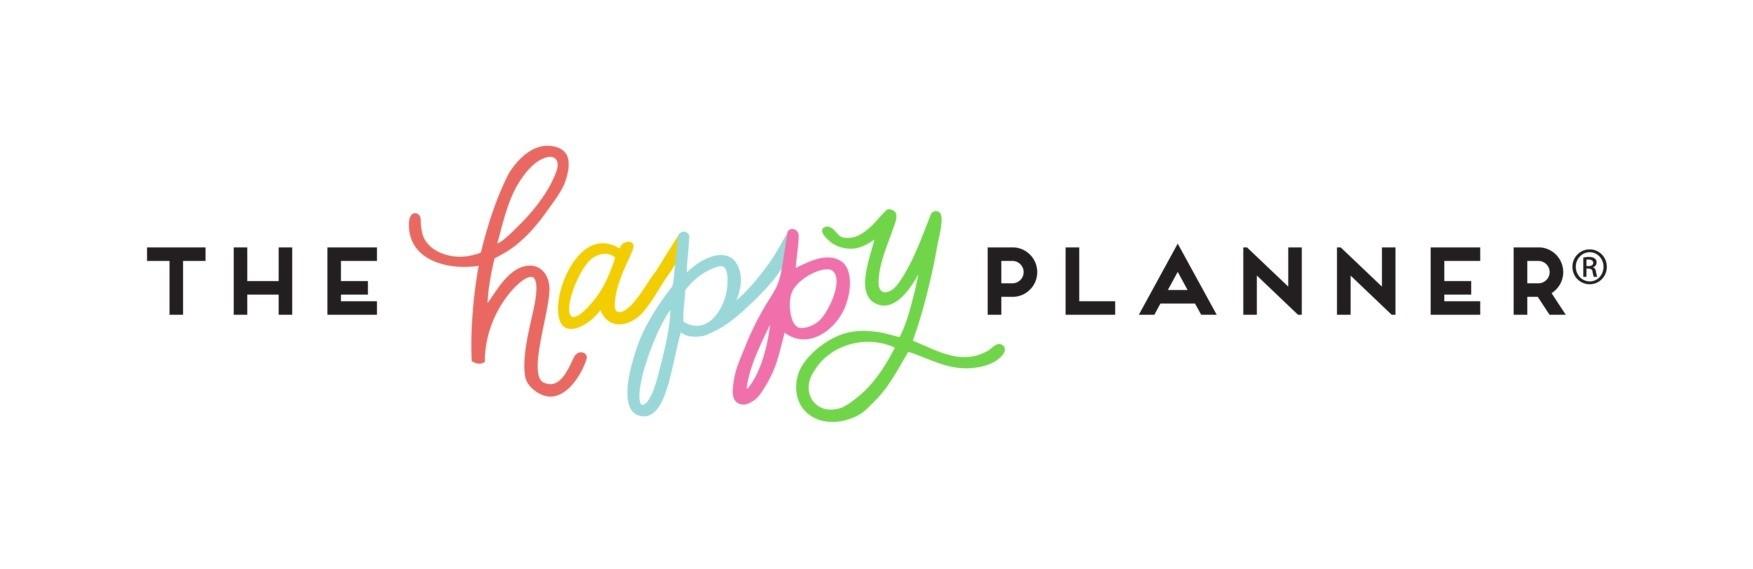 The Happy Planner Vouchers